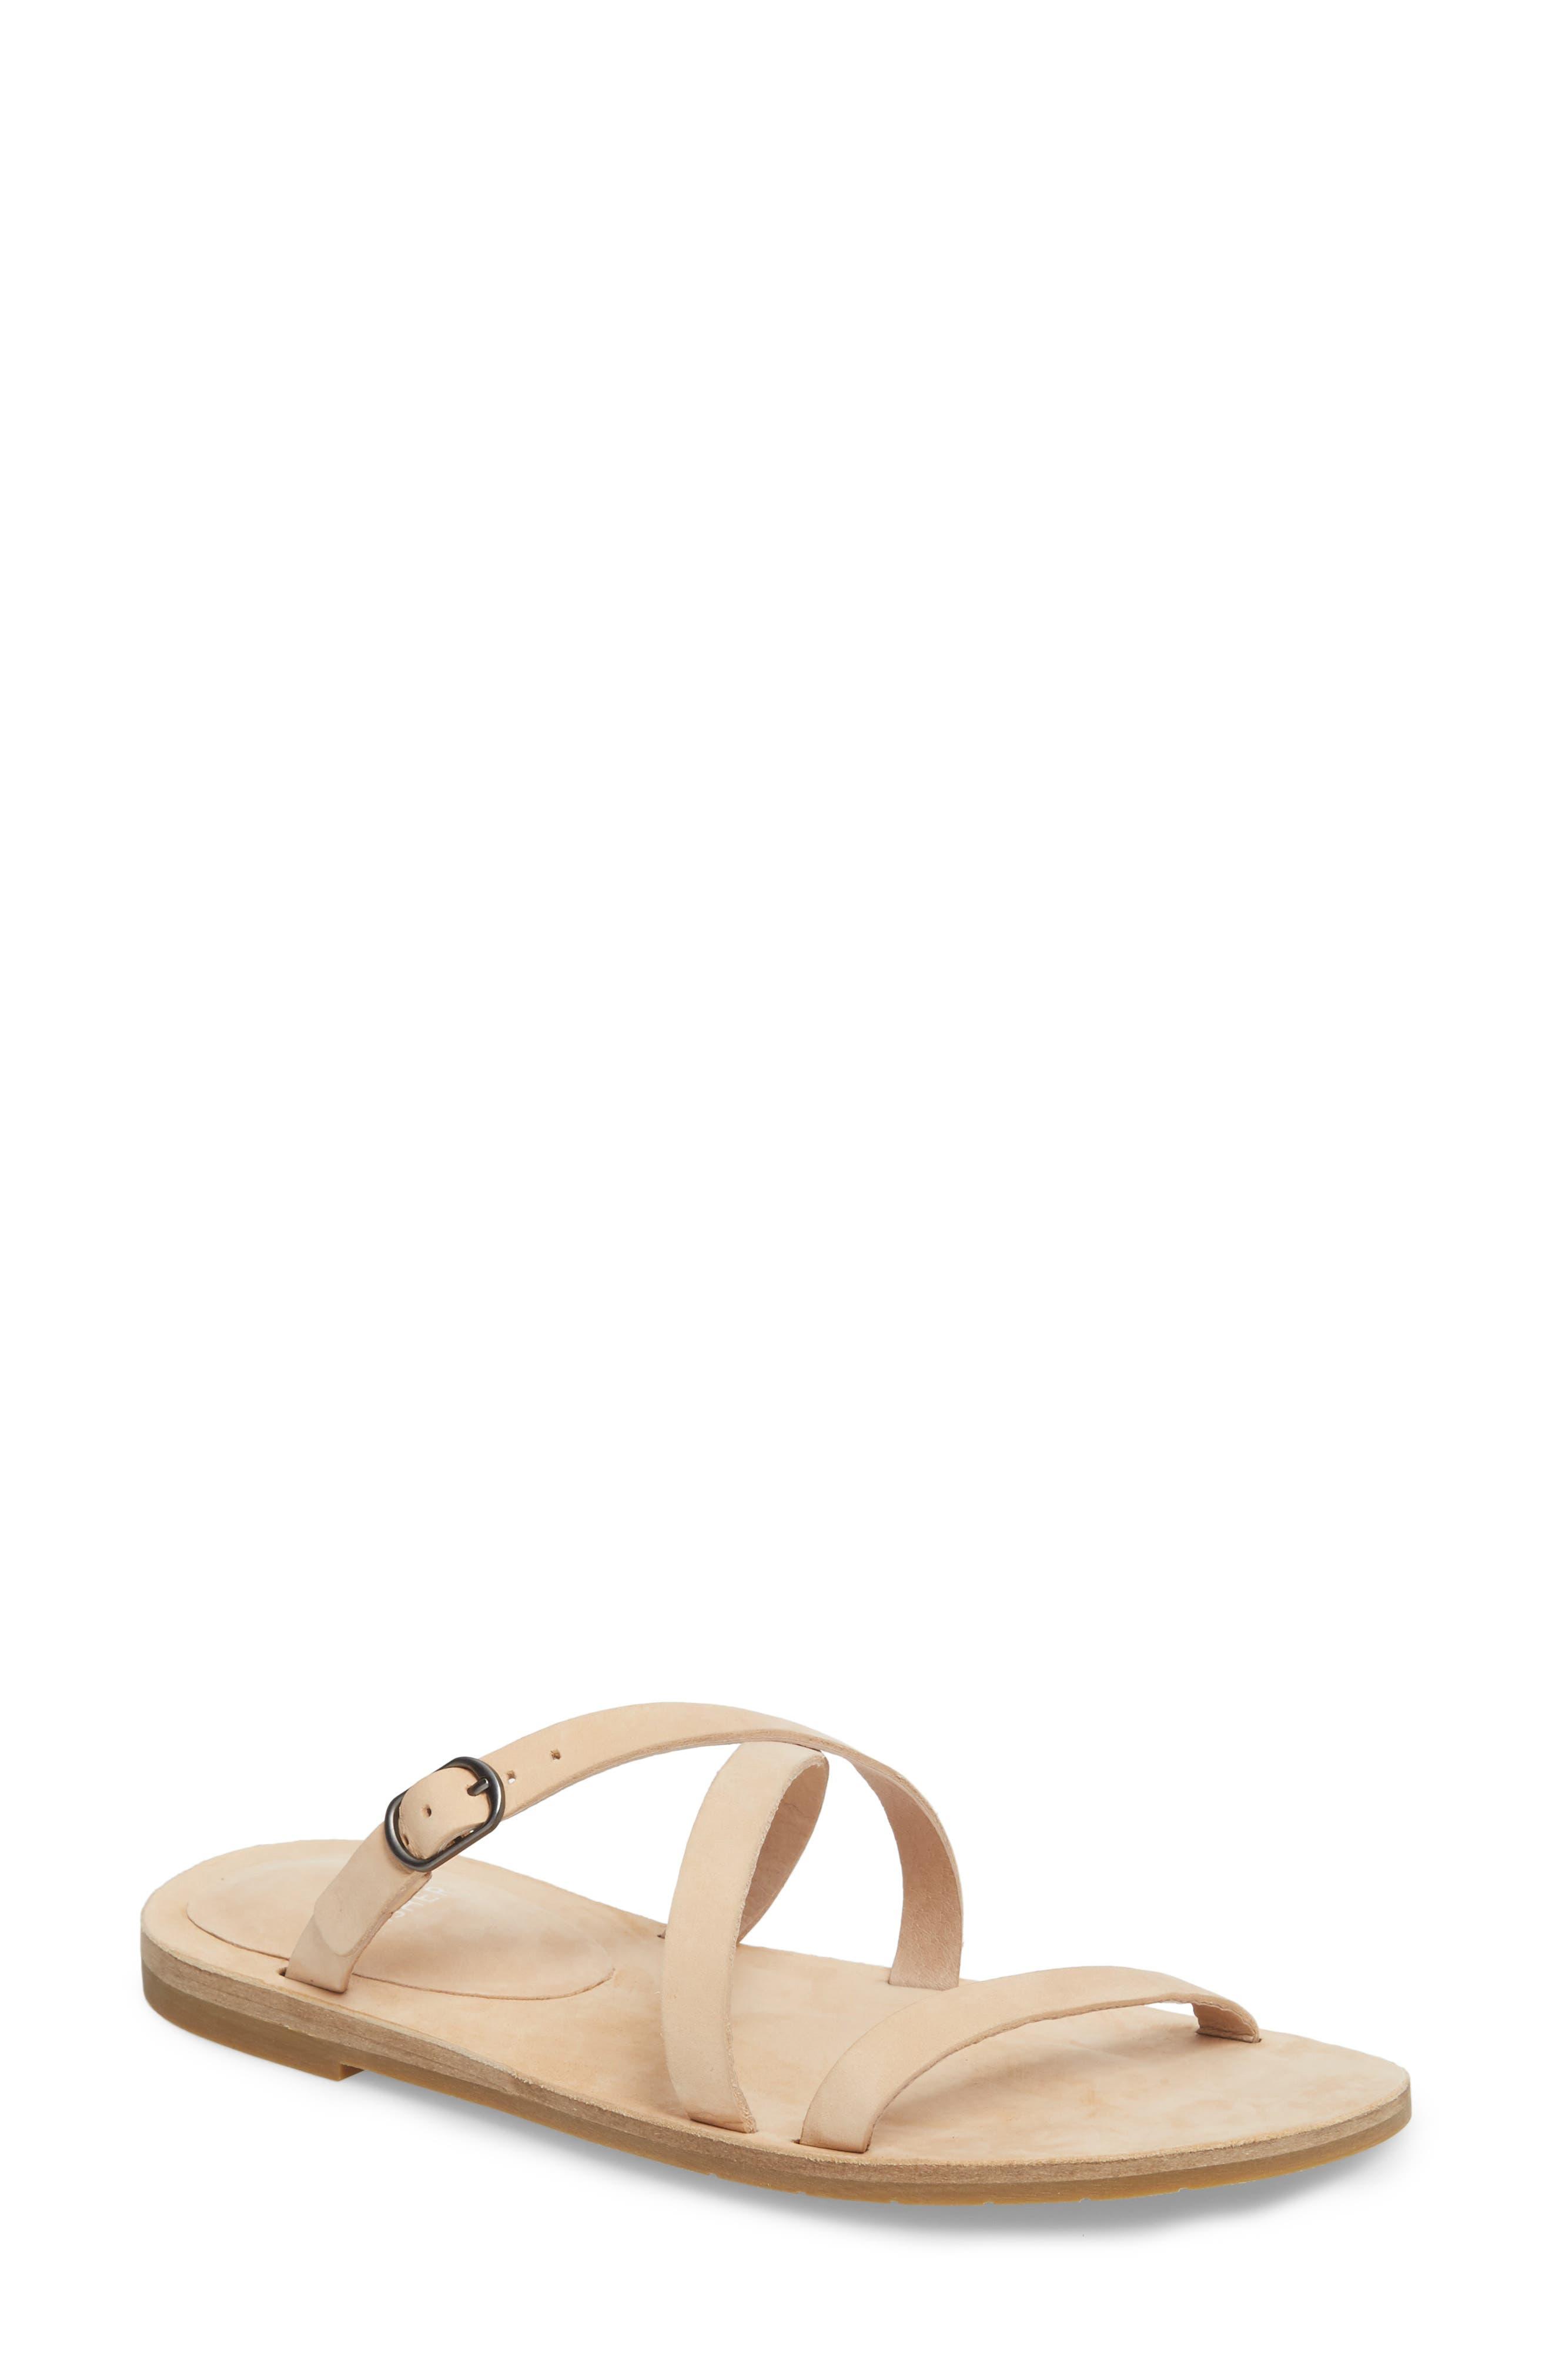 Dali Strappy Slide Sandal,                             Main thumbnail 2, color,